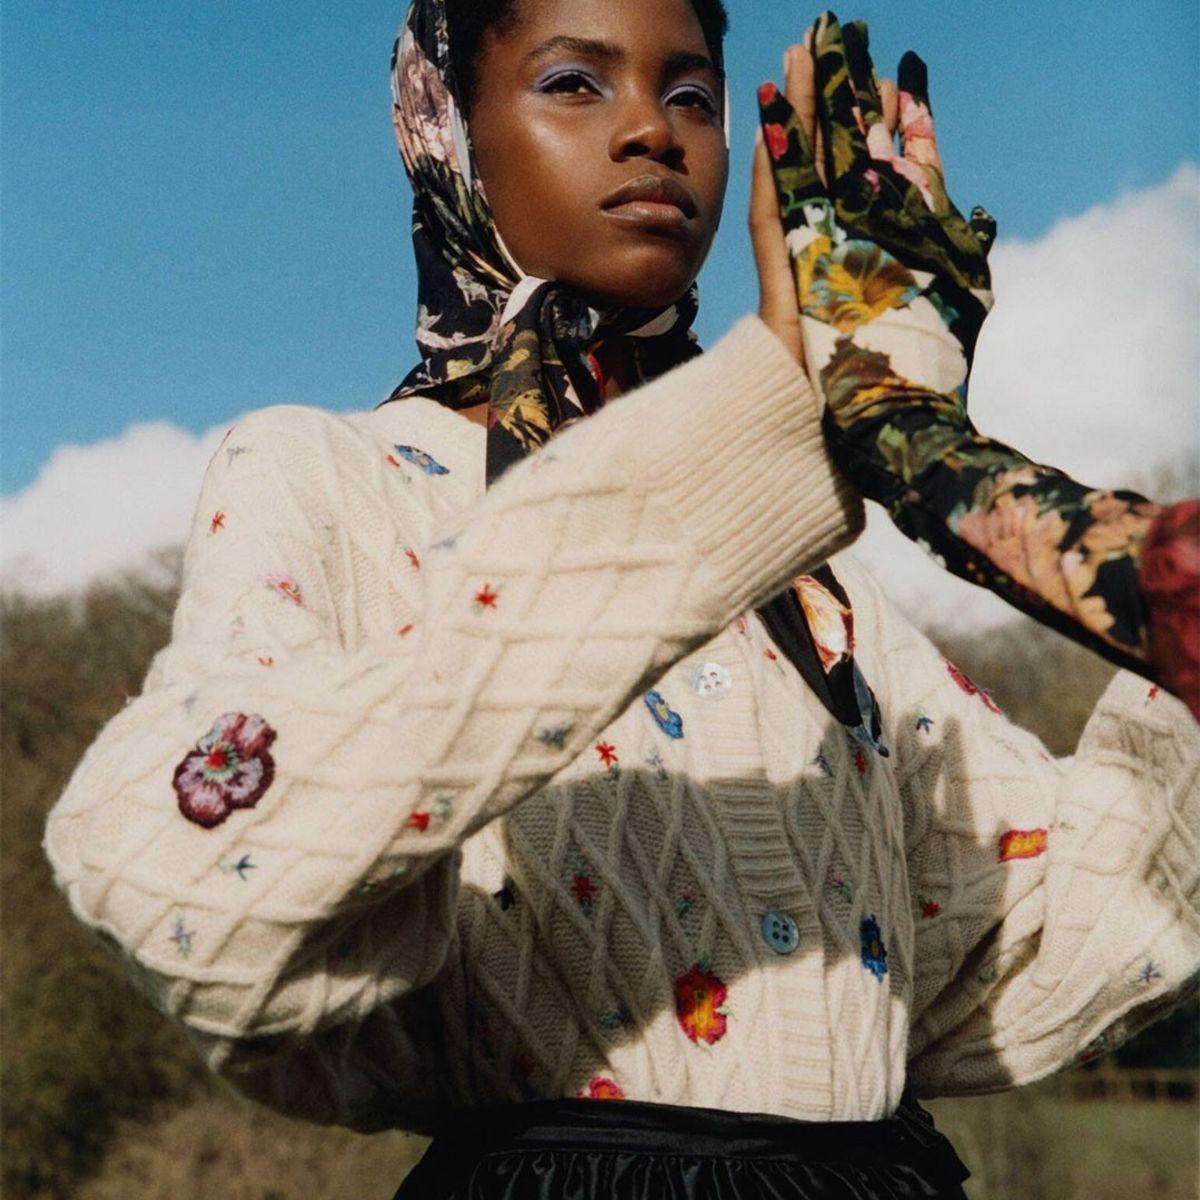 Fashion Brands 👗👖 All Body Positive ✅ Women Will Love 💜 ...